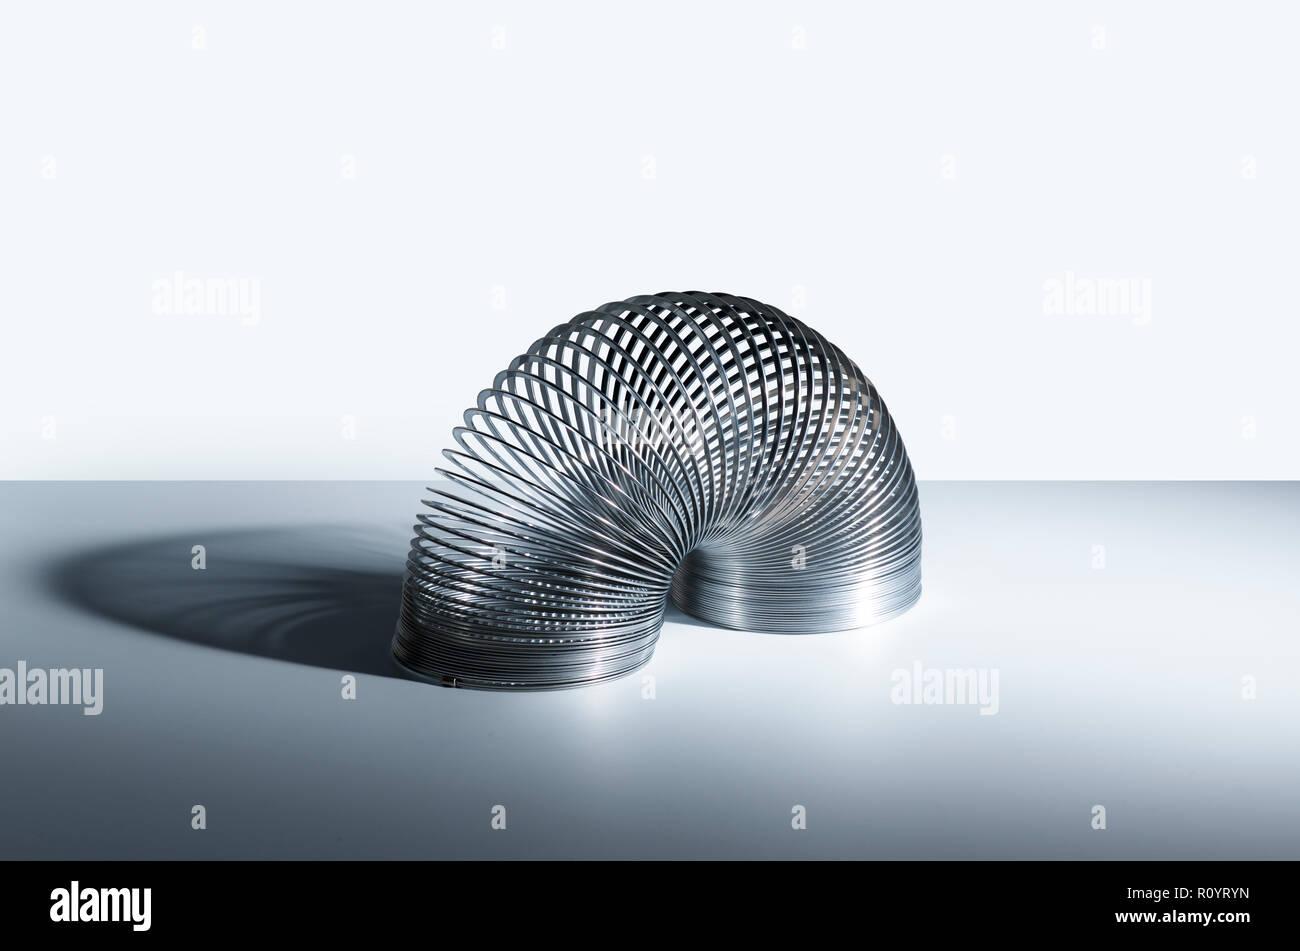 Slinky Toy Piegata A Semicerchio In Forma Studio Still Life Foto